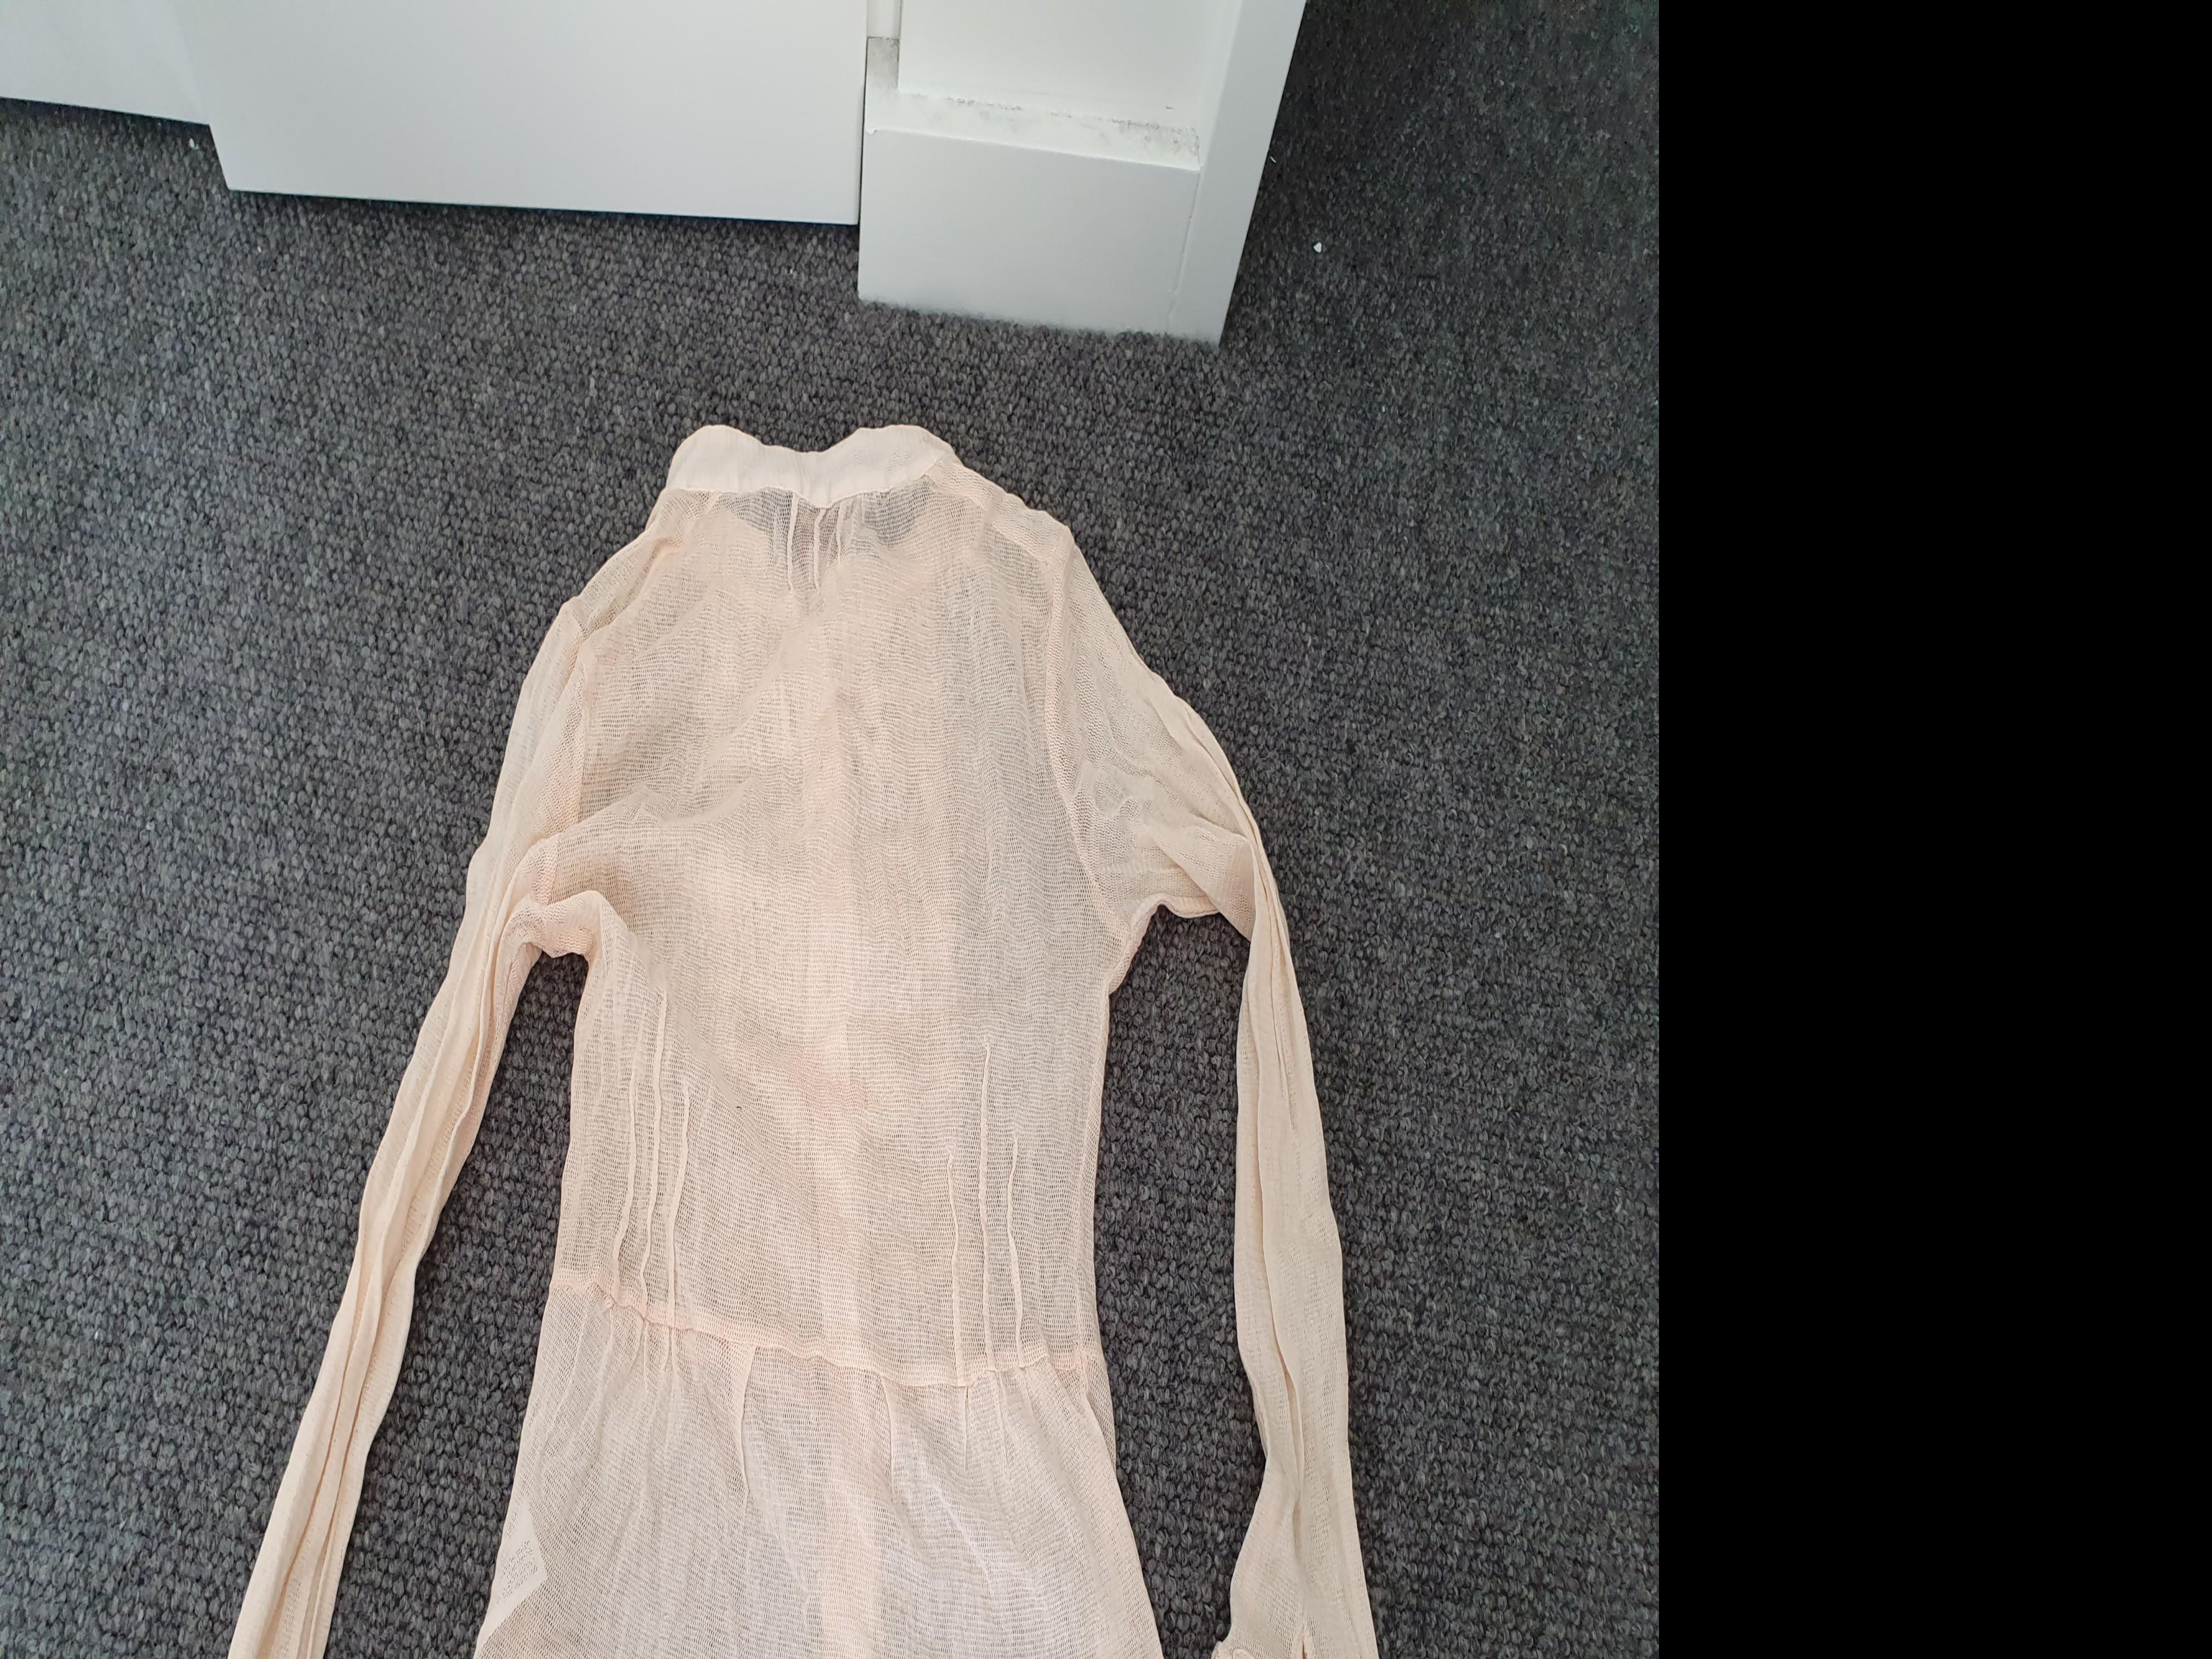 Essentiel - girls long sleeves lace pale peach top - sz 14 #swapau